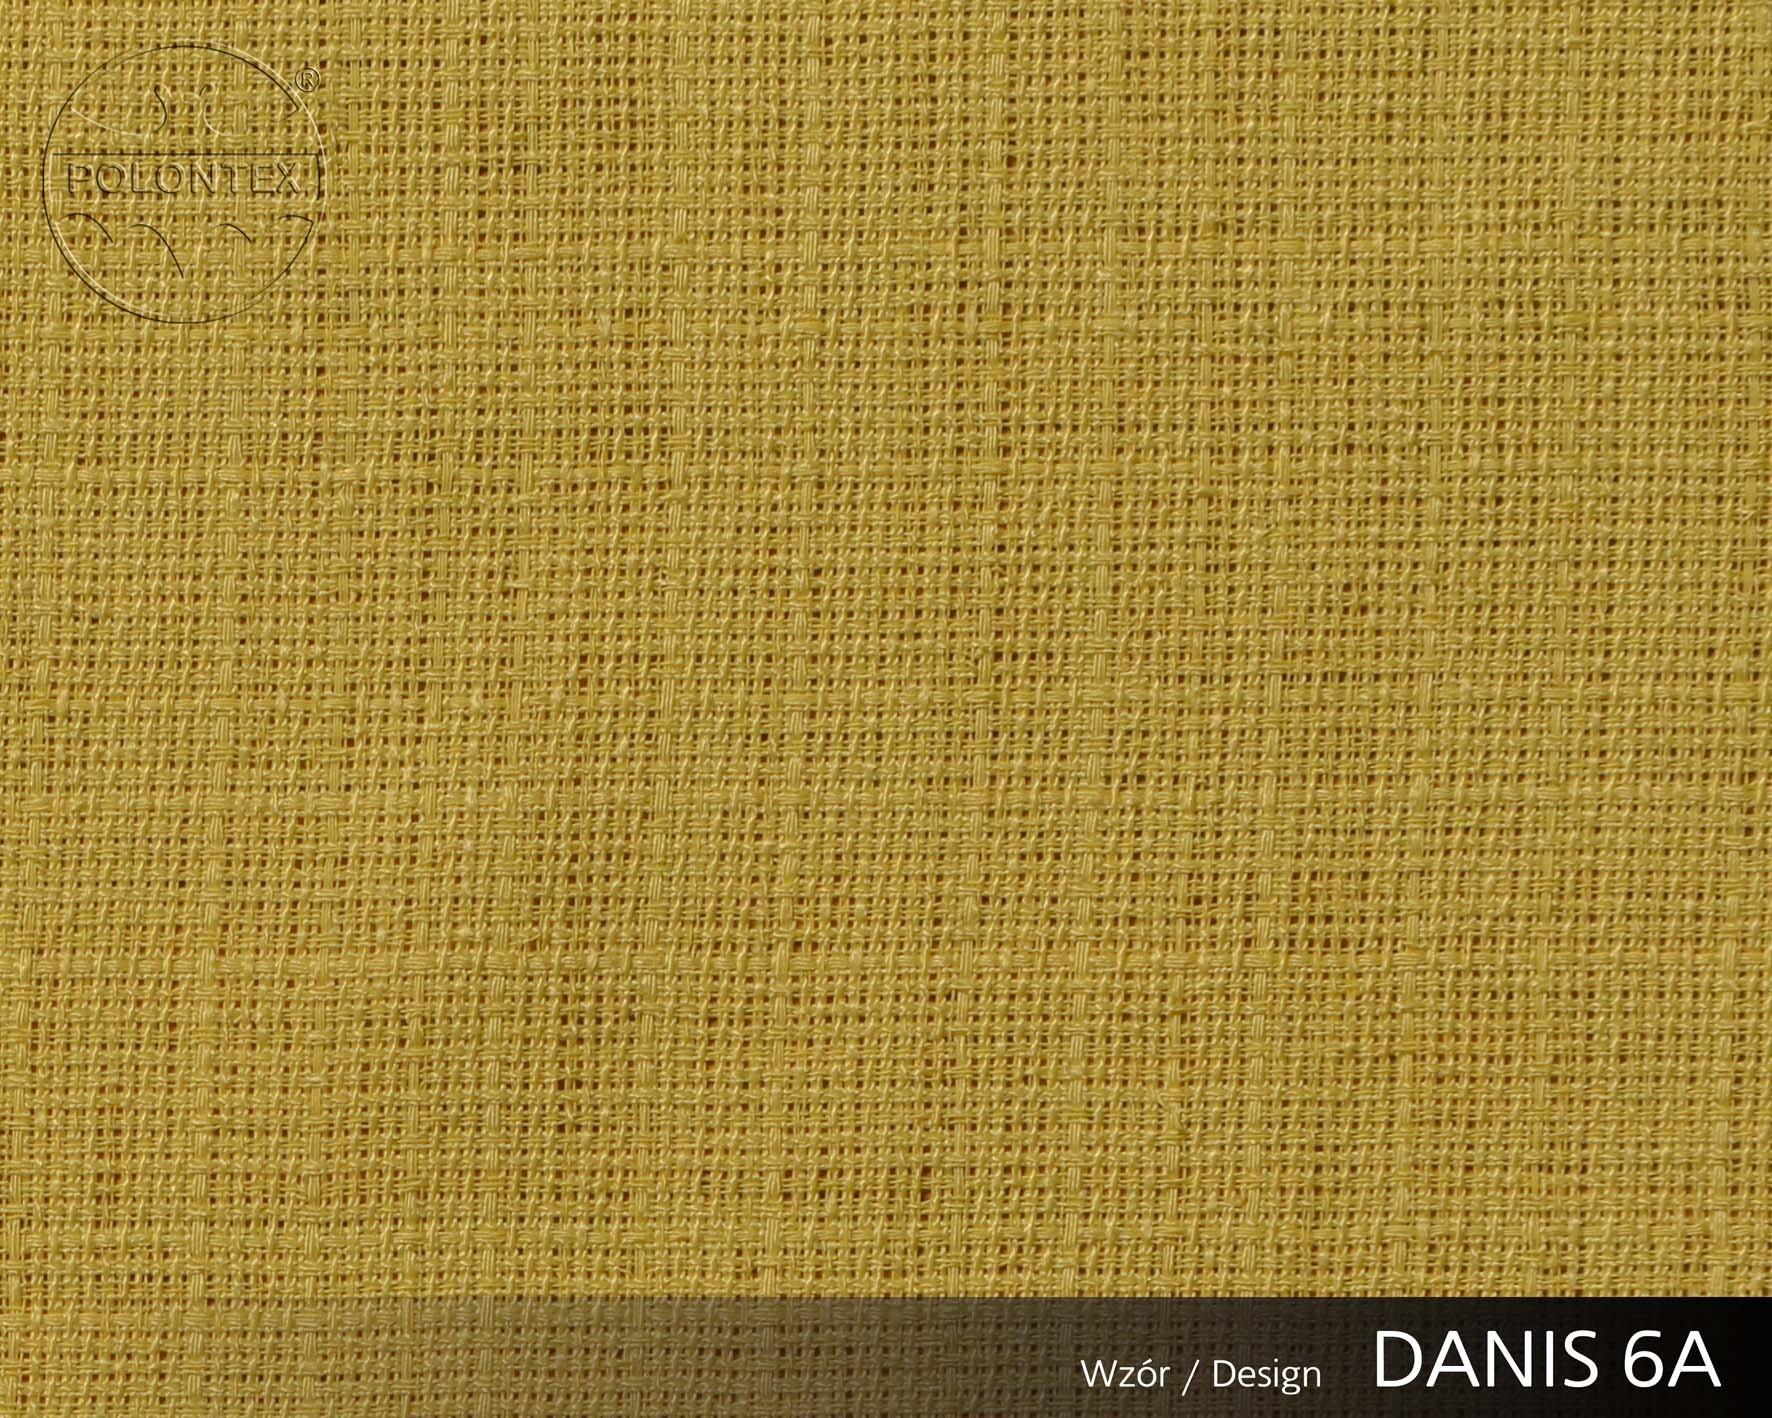 DANIŚ 2128